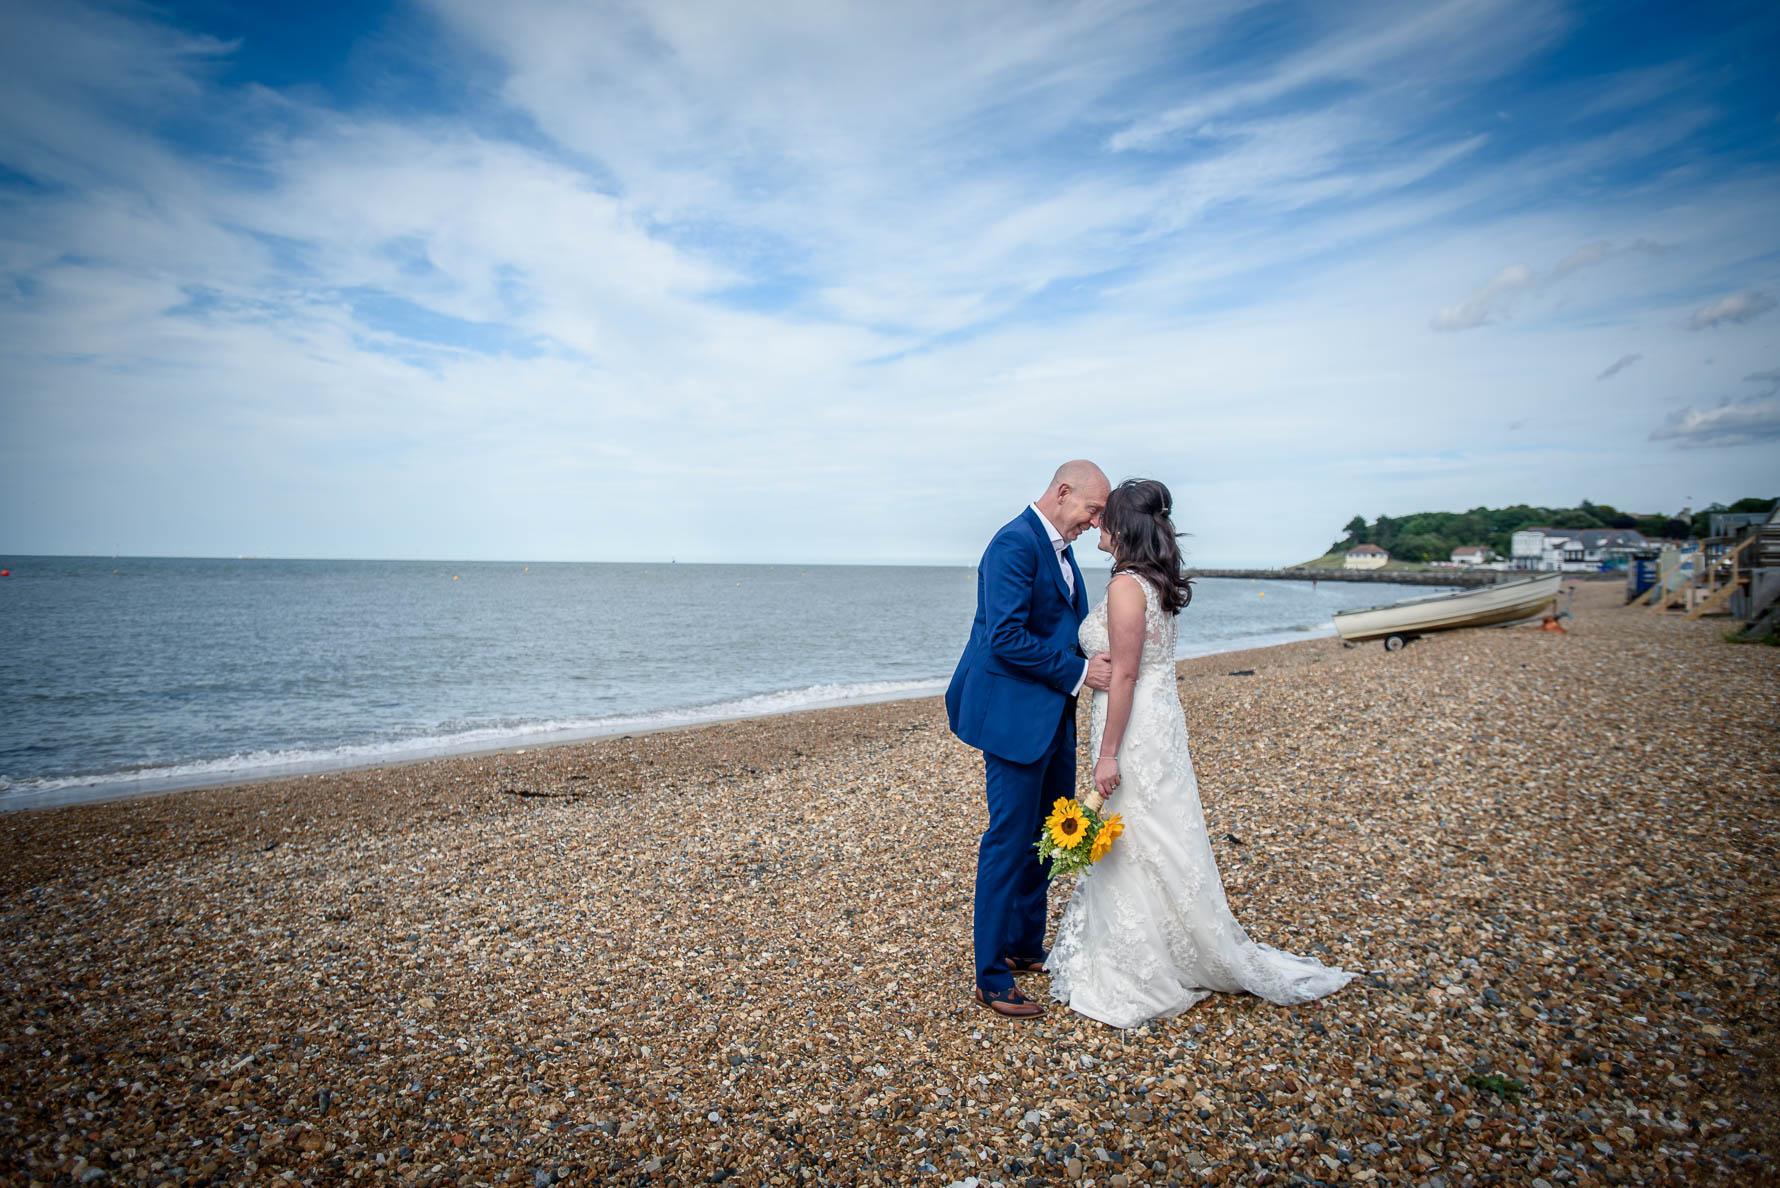 Wedding Photography at East Quay Venue-64.jpg